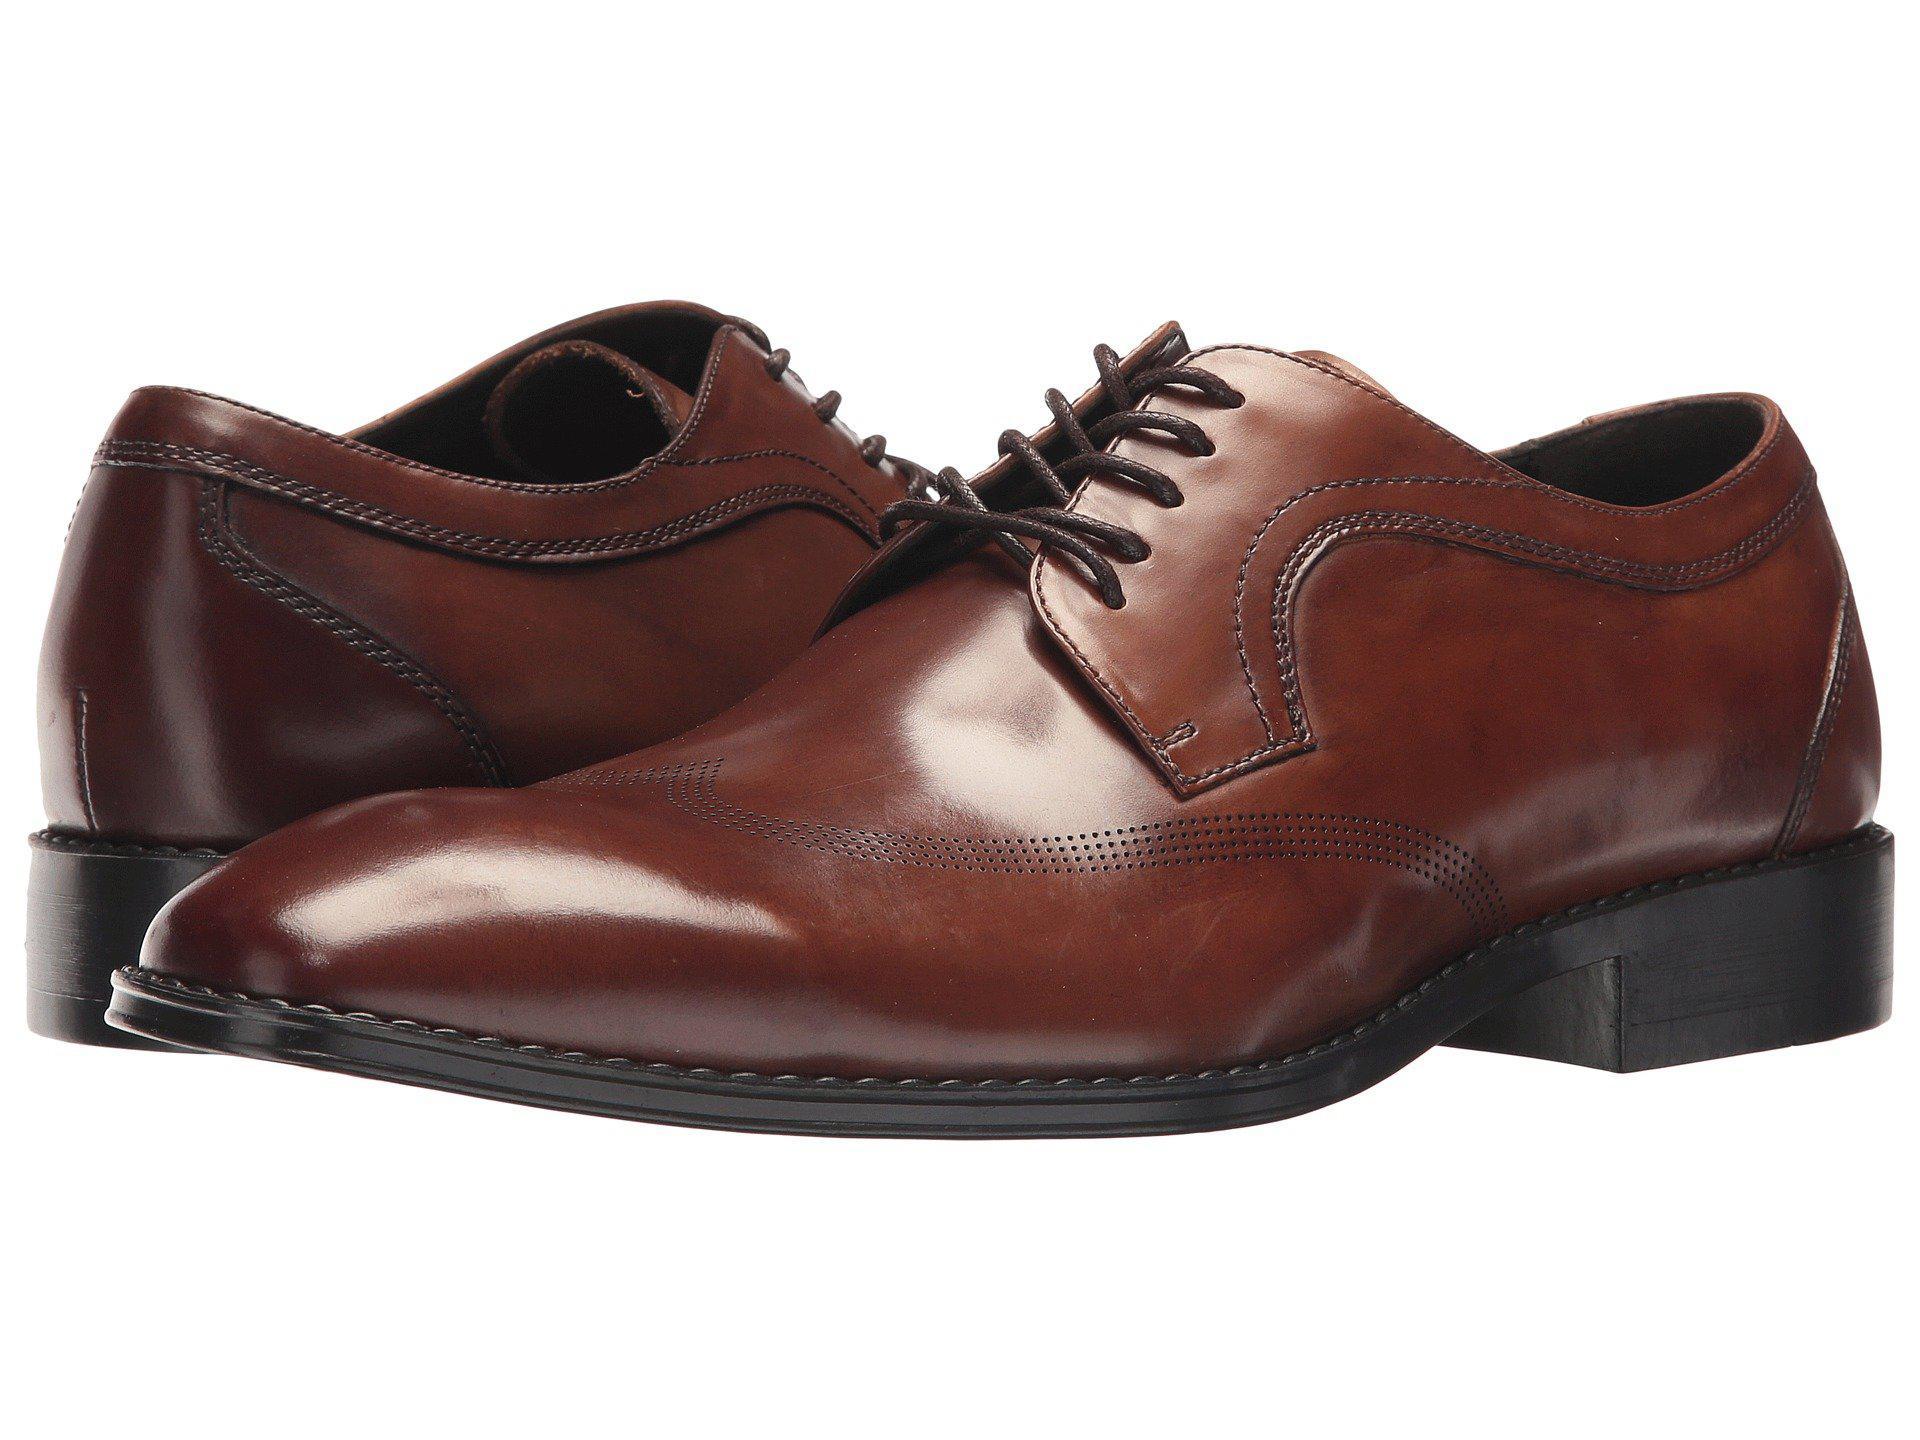 329fe9383dbc77 kenneth-cole-reaction-Cognac-Reason-Oxford-cognac-Mens -Lace-Up-Casual-Shoes.jpeg